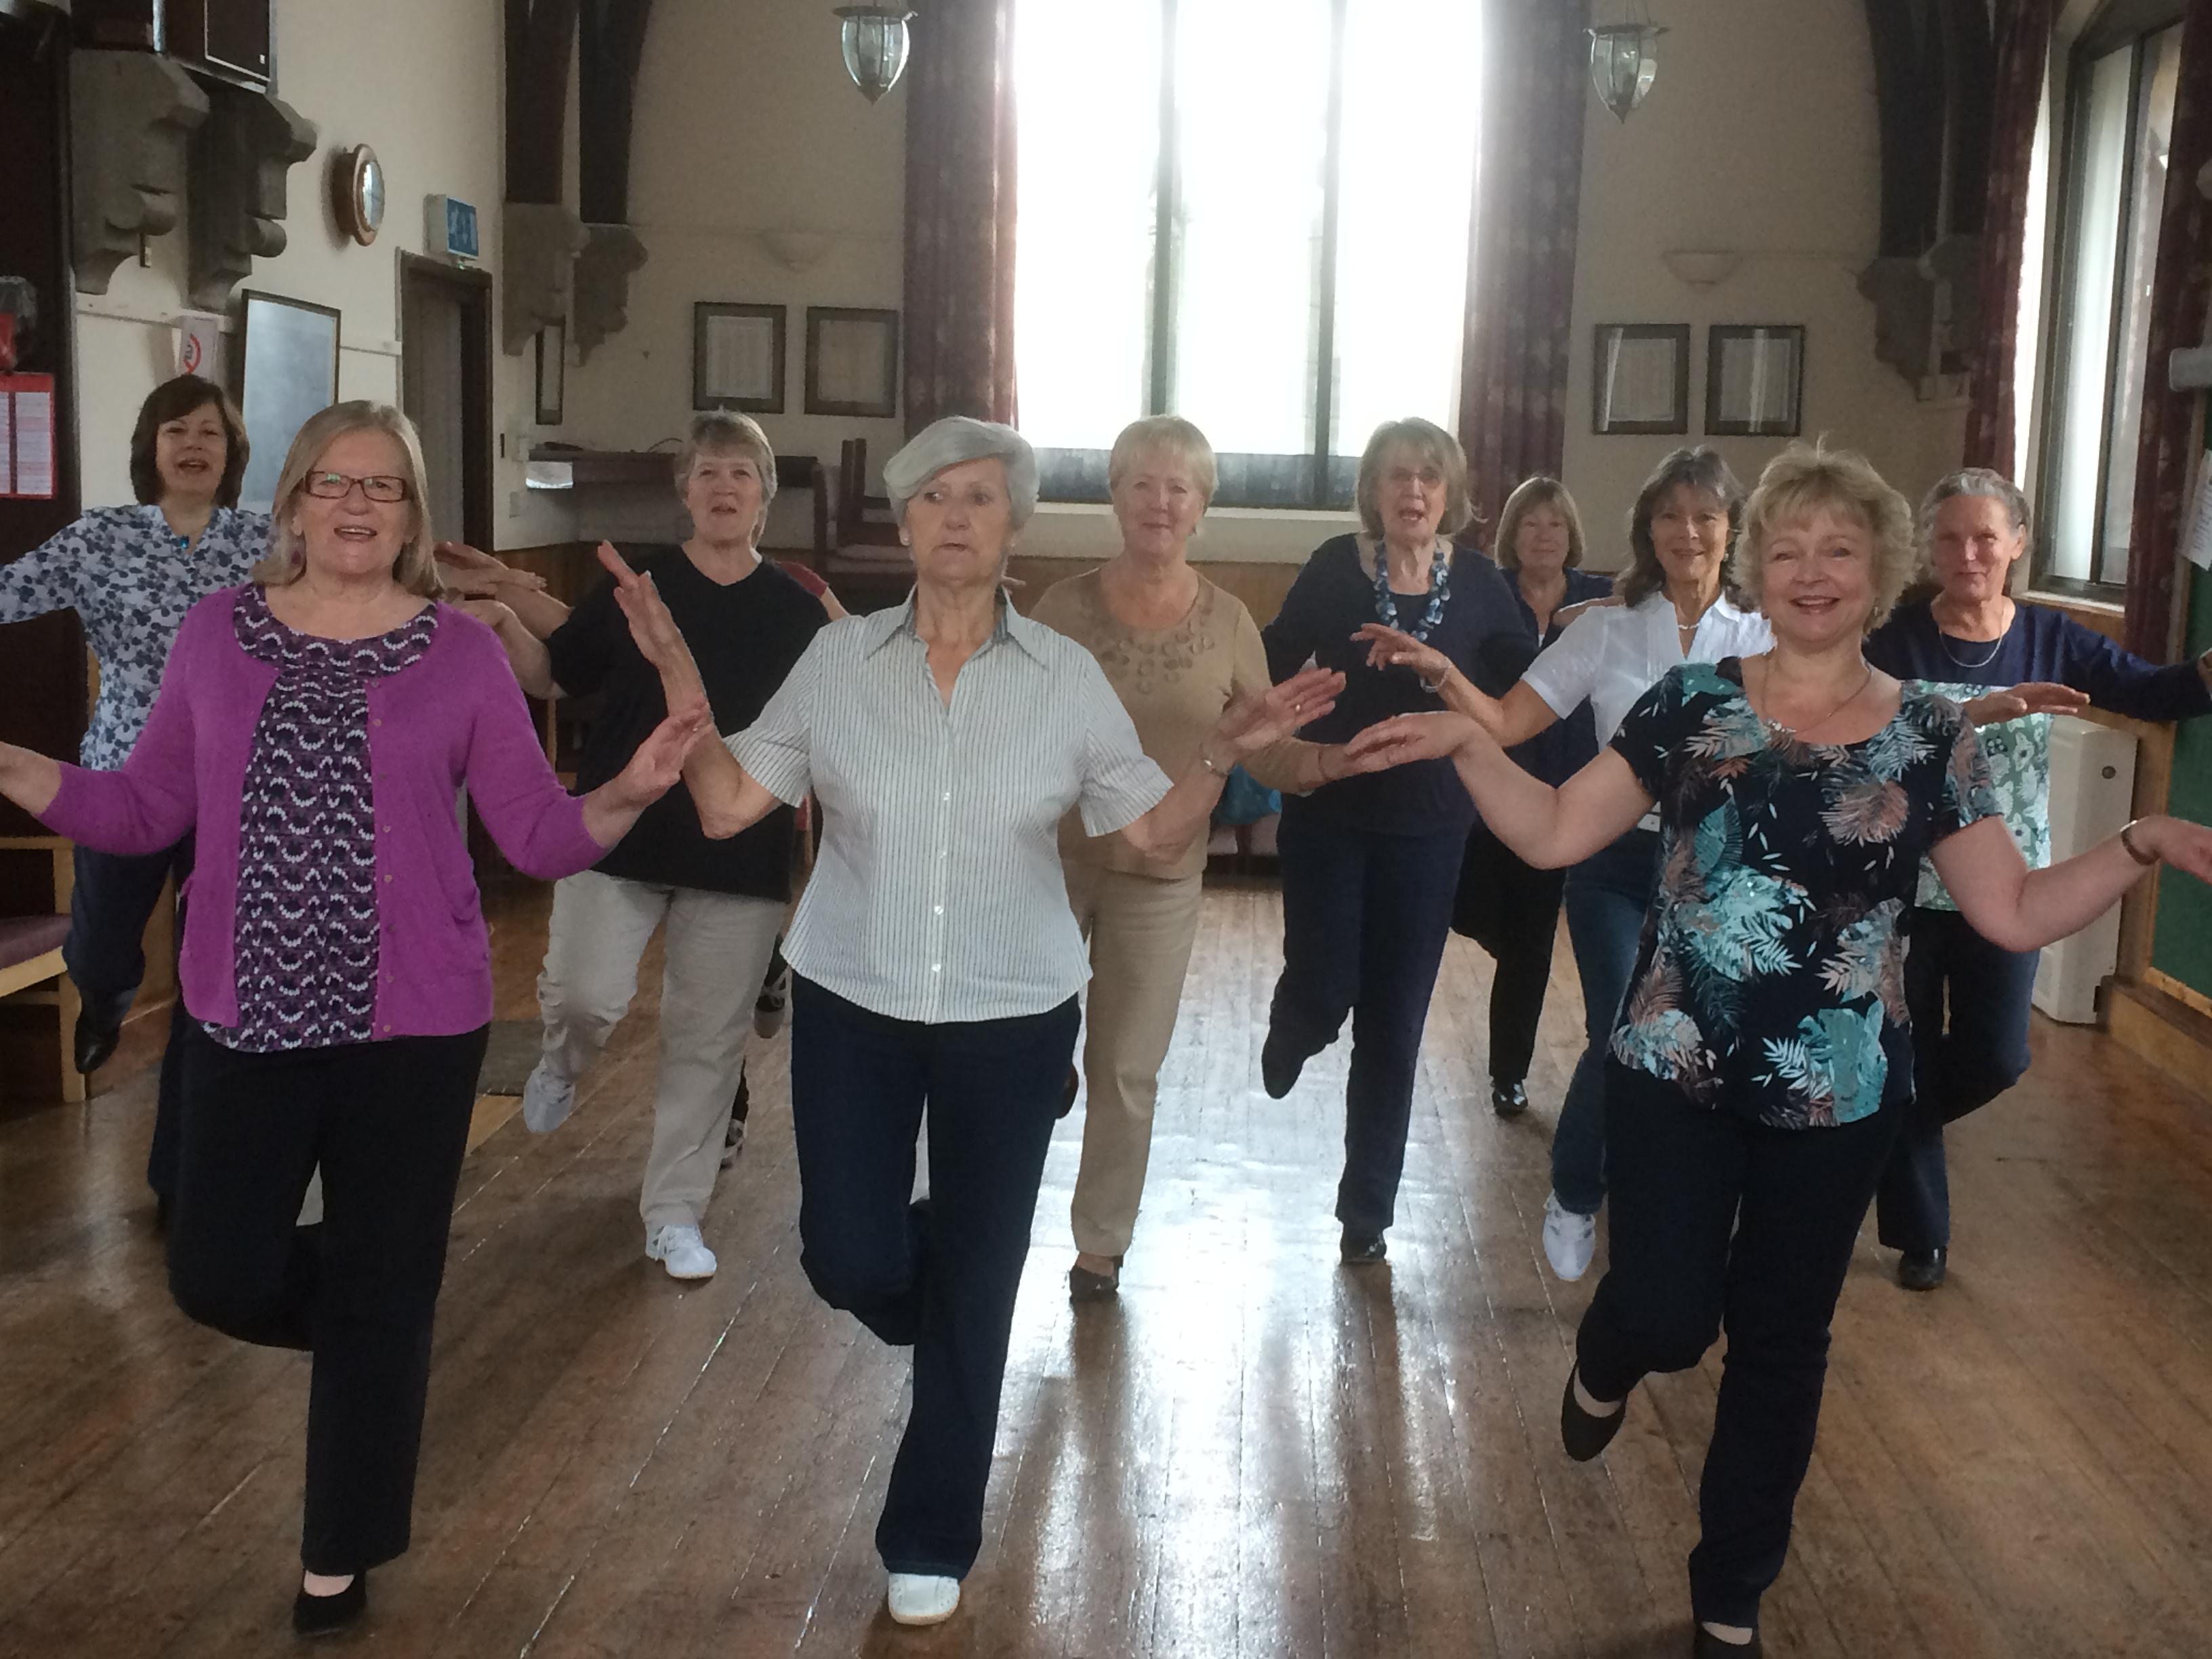 Teaching line dancing Stamford area